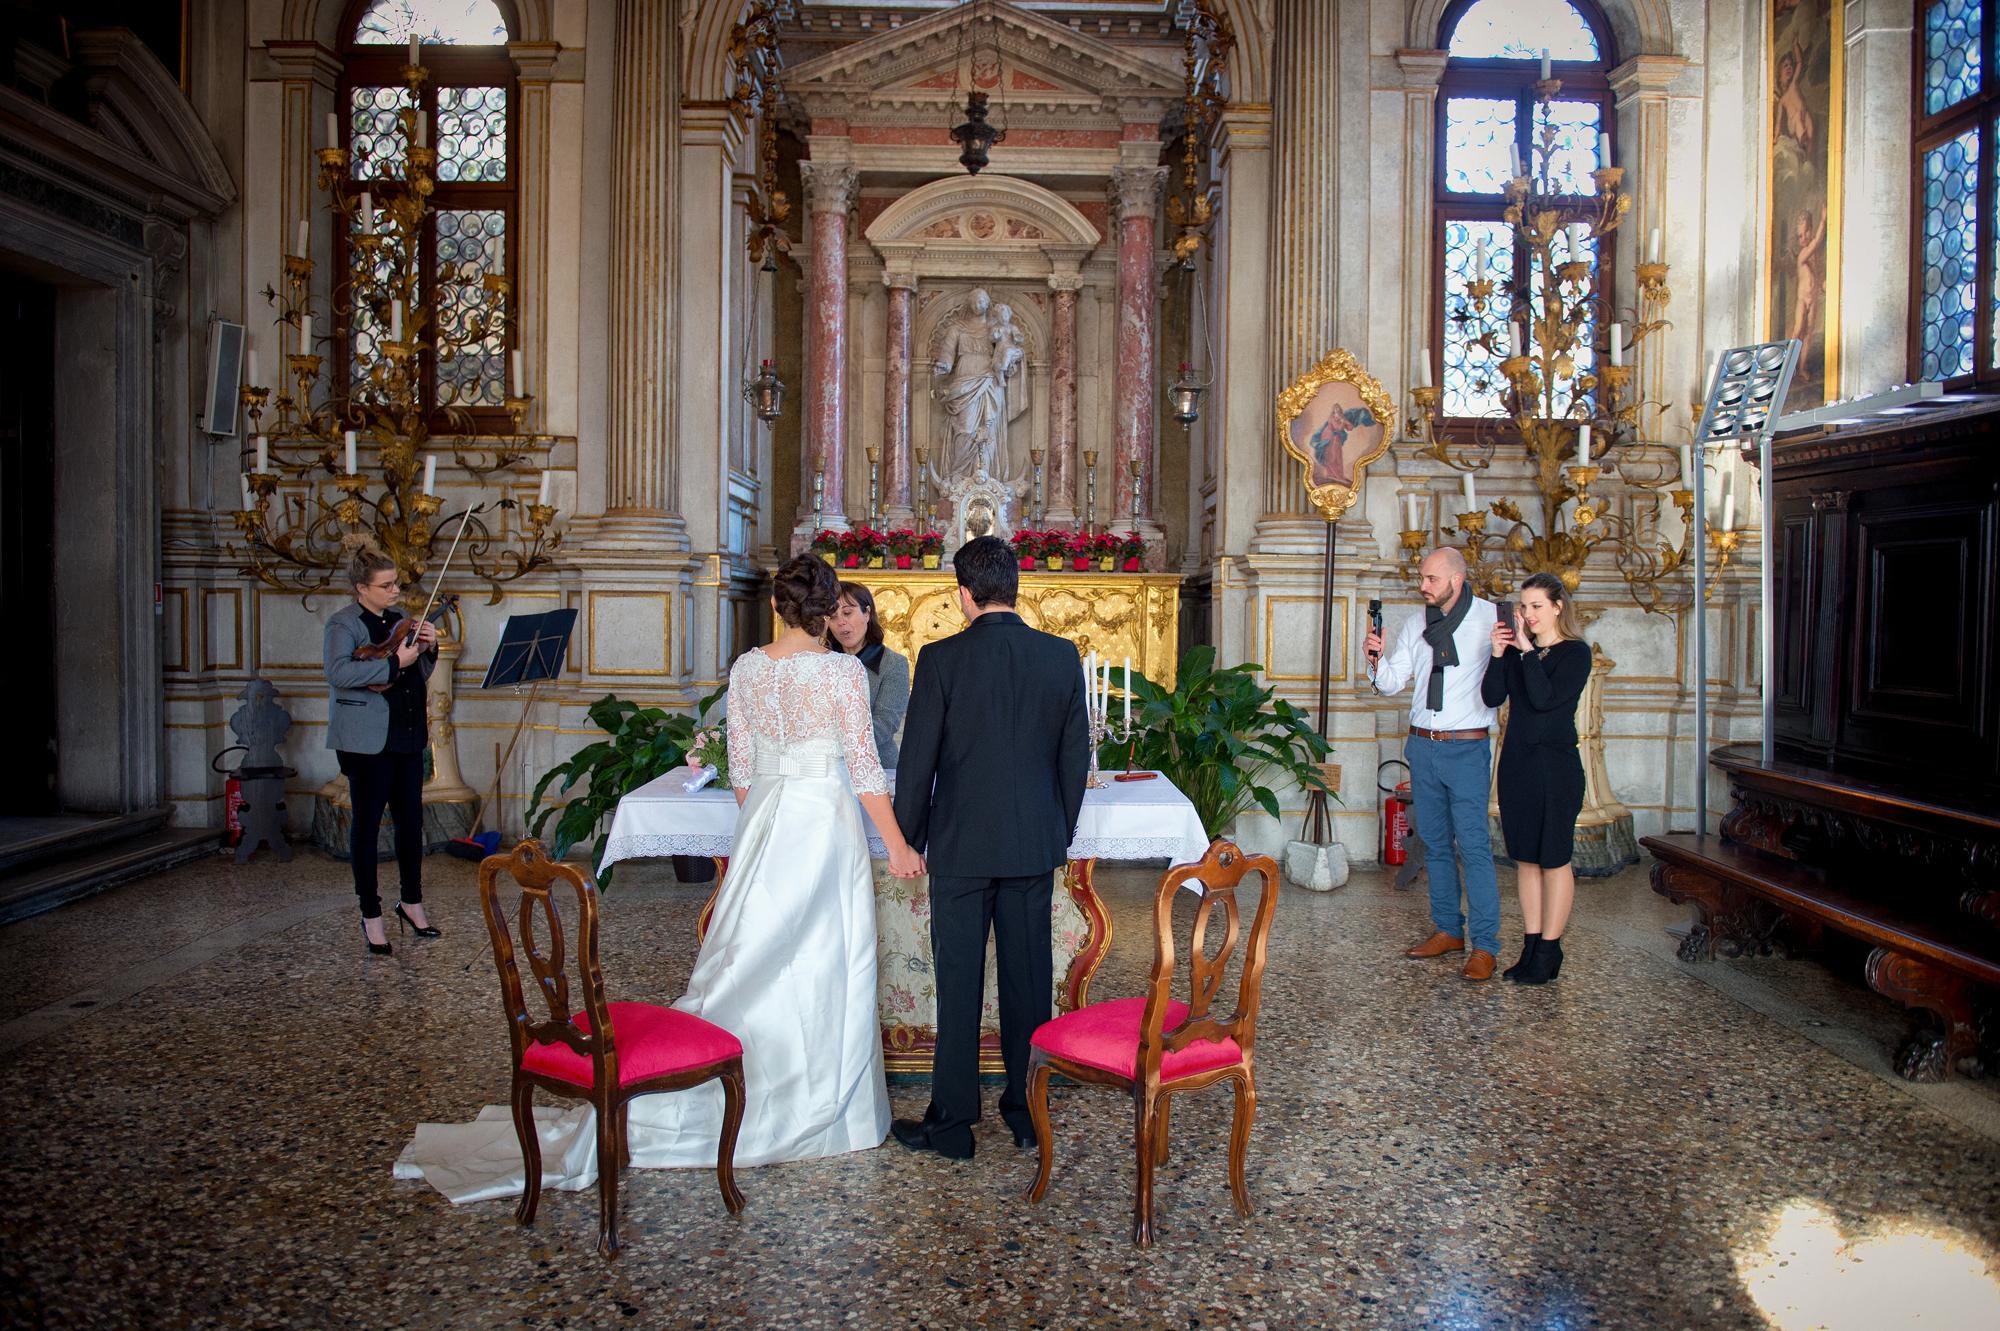 venezia matrimonio simbolico fotografia carmini laure jacquemin fotografo (6)